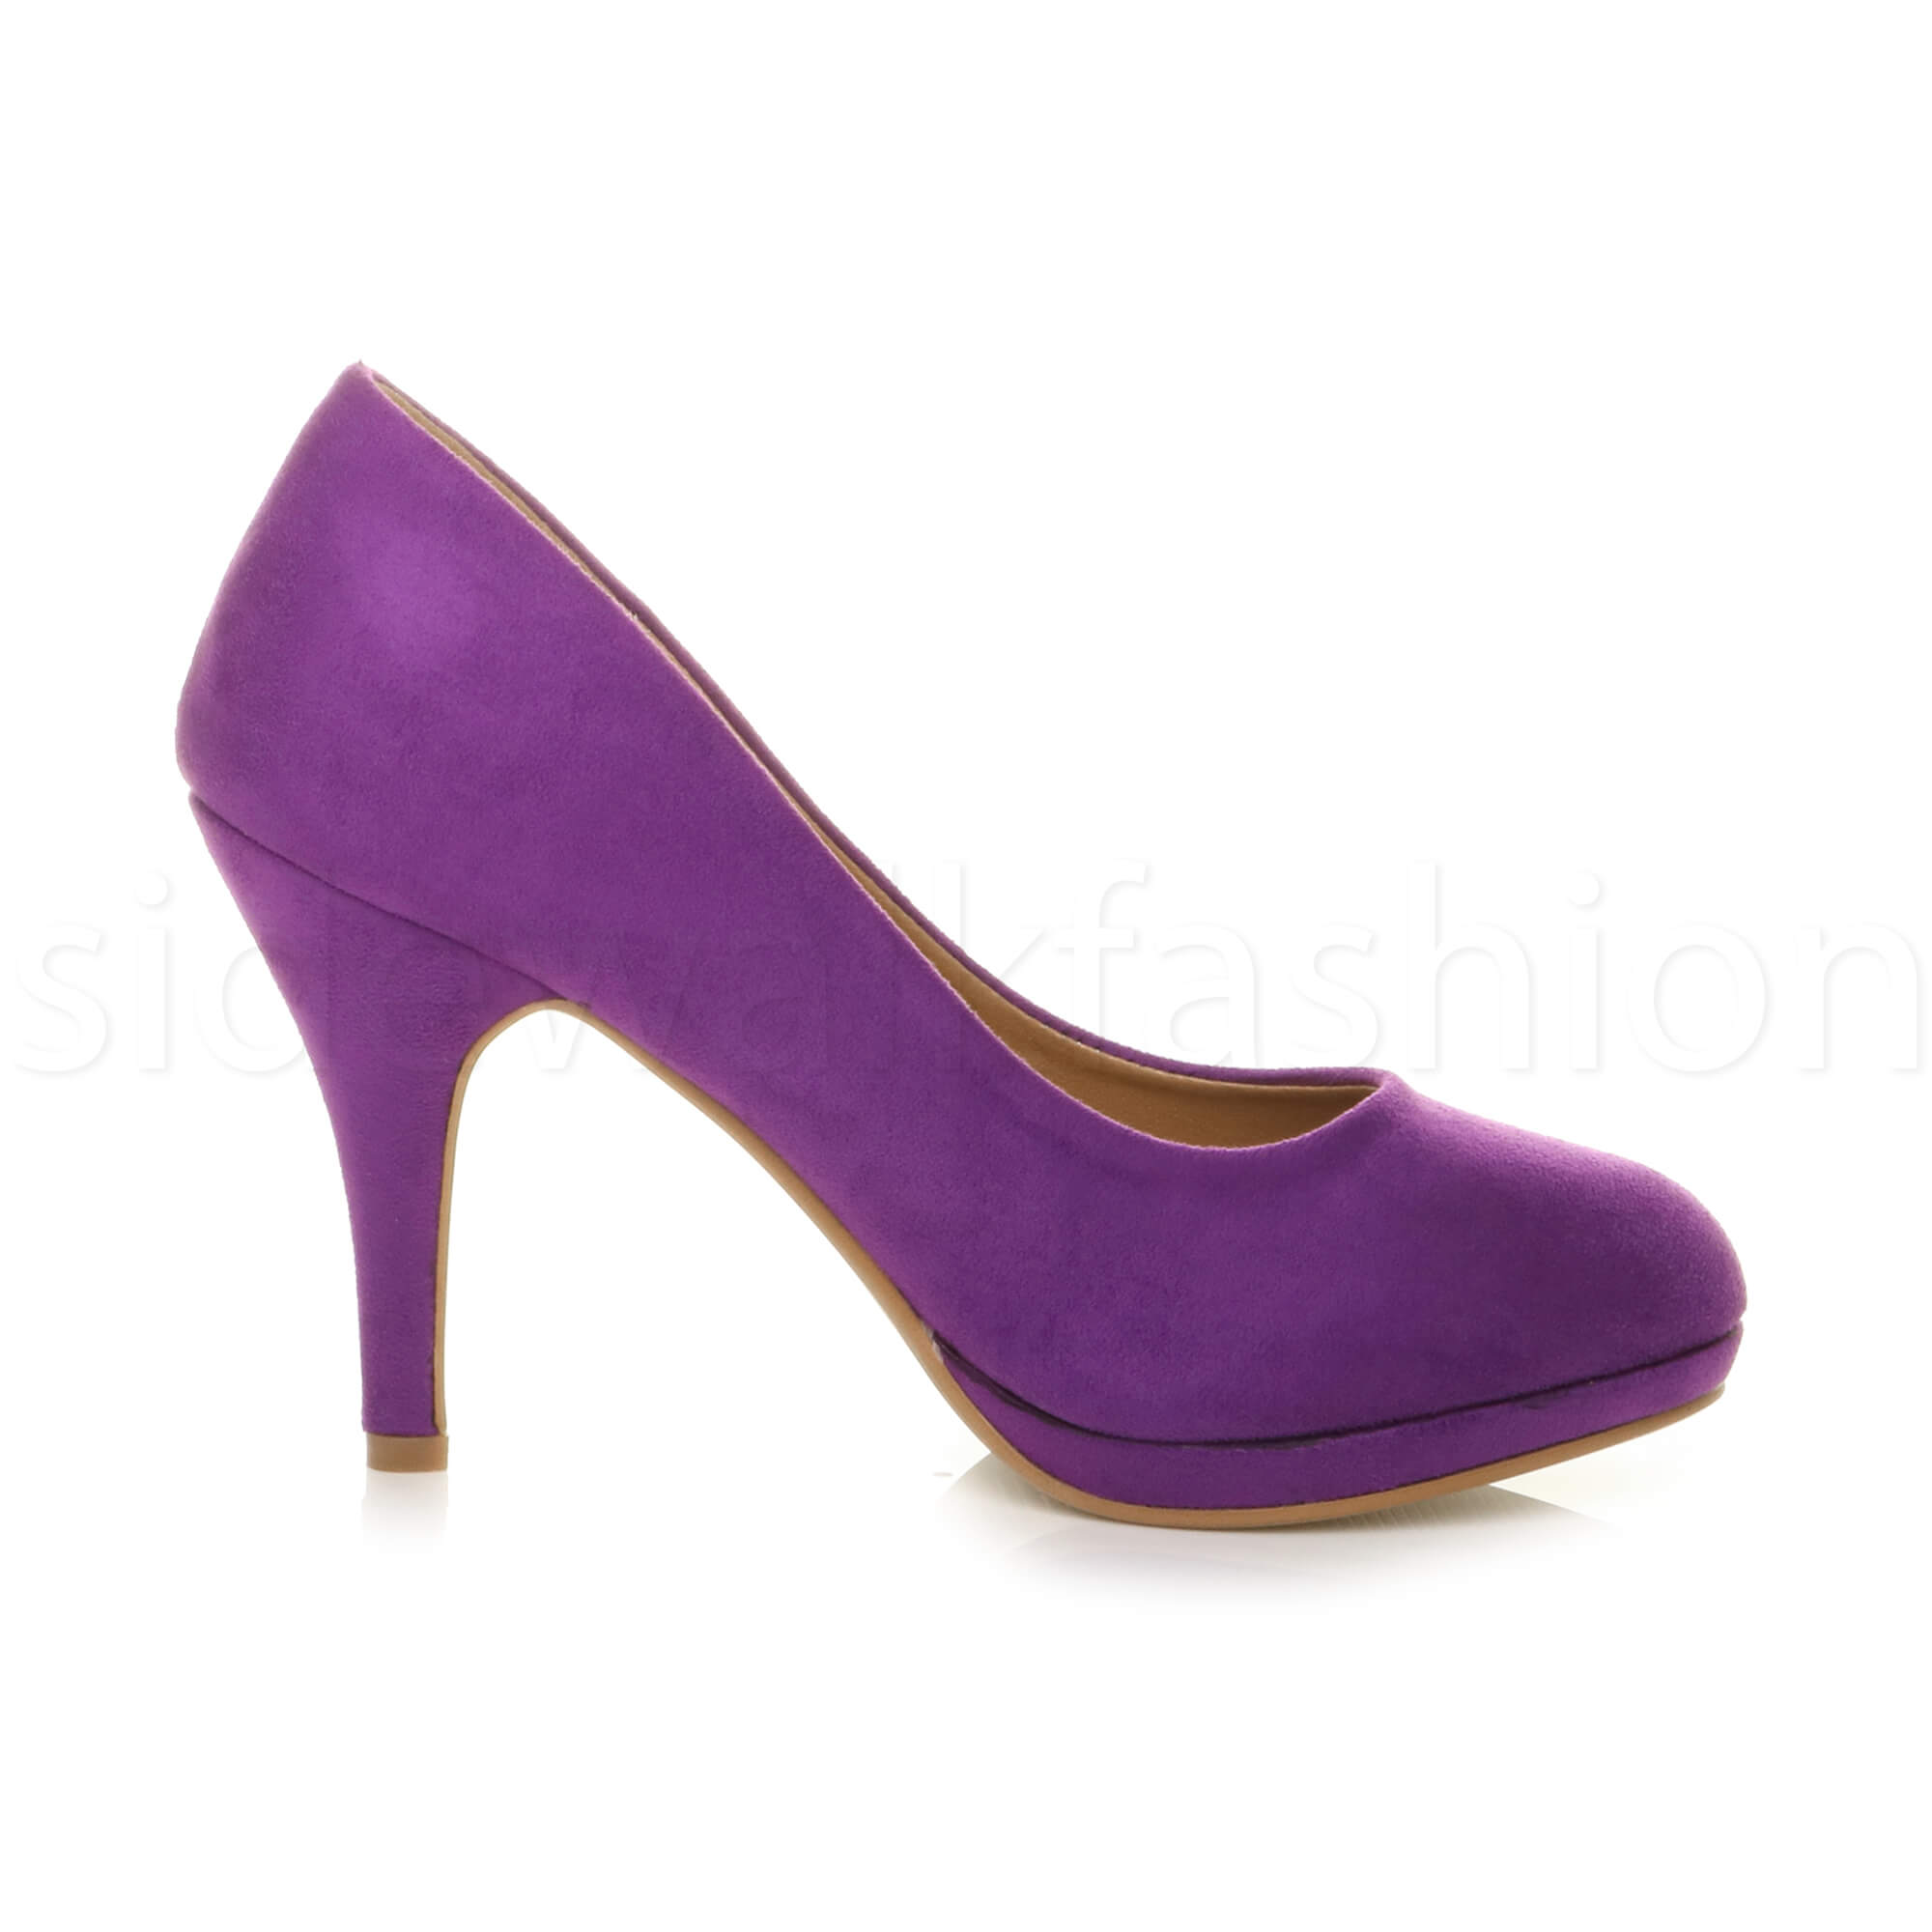 Womens-ladies-high-mid-heel-platform-wedding-evening-bridesmaid-court-shoes-size thumbnail 137